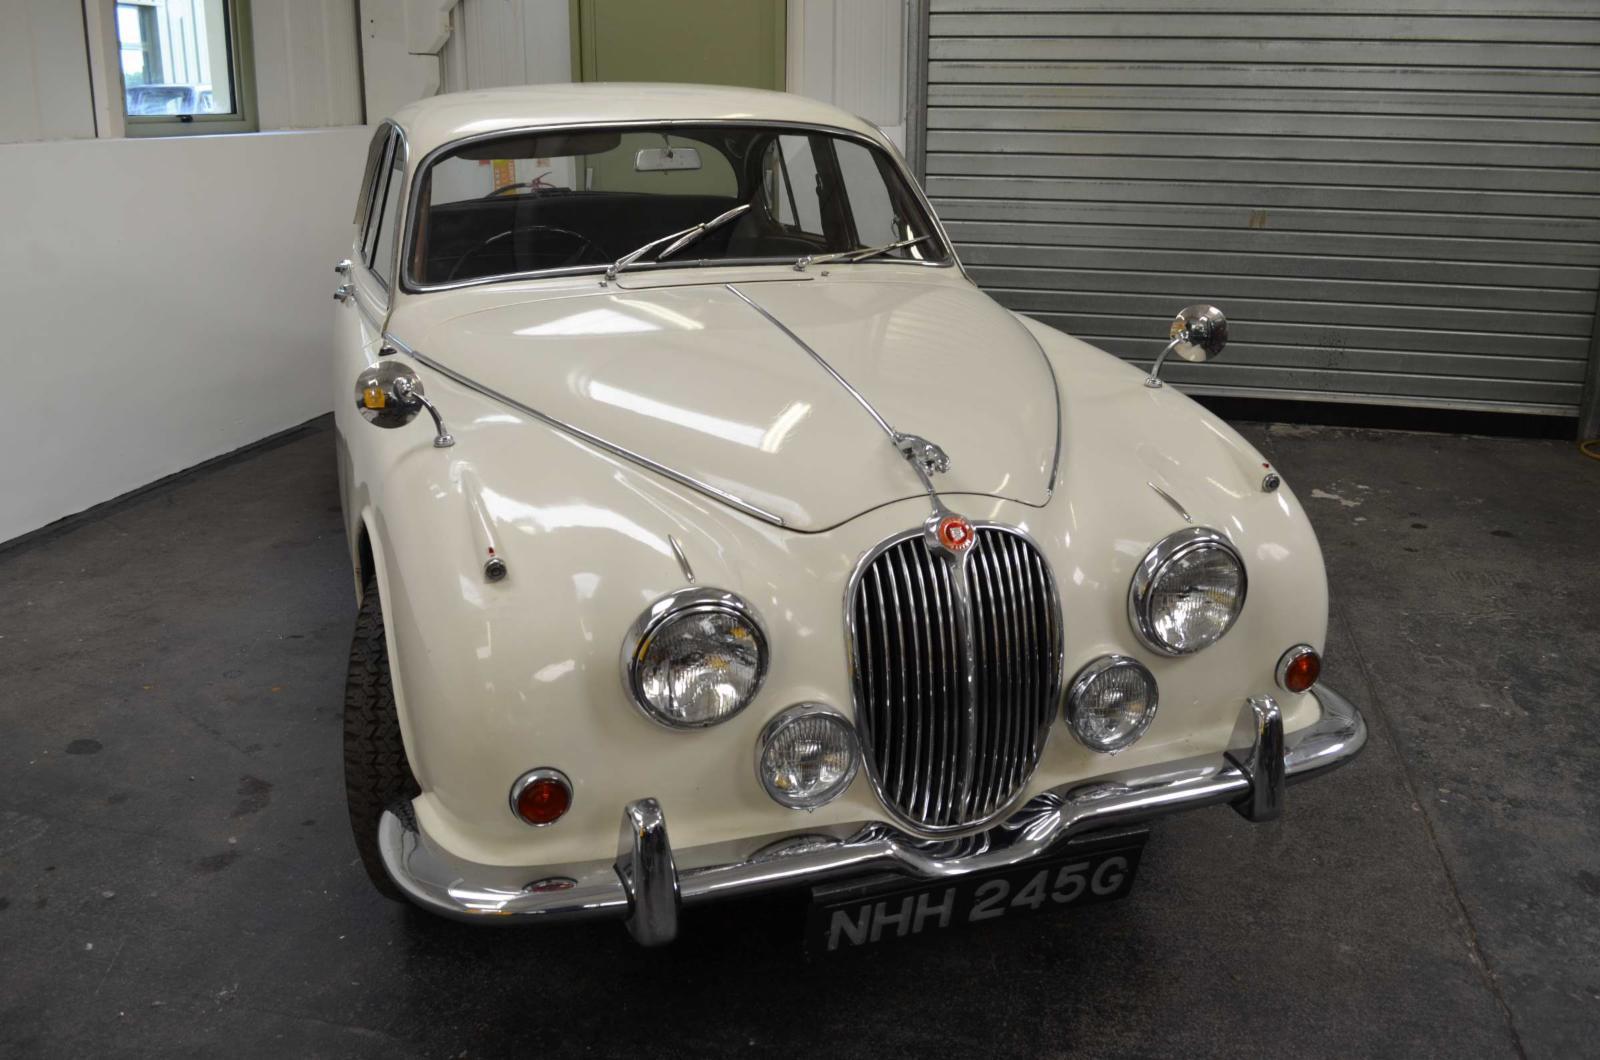 1968 Jaguar MK2 340 - Just 43,000 miles from new for sale | Castle ...